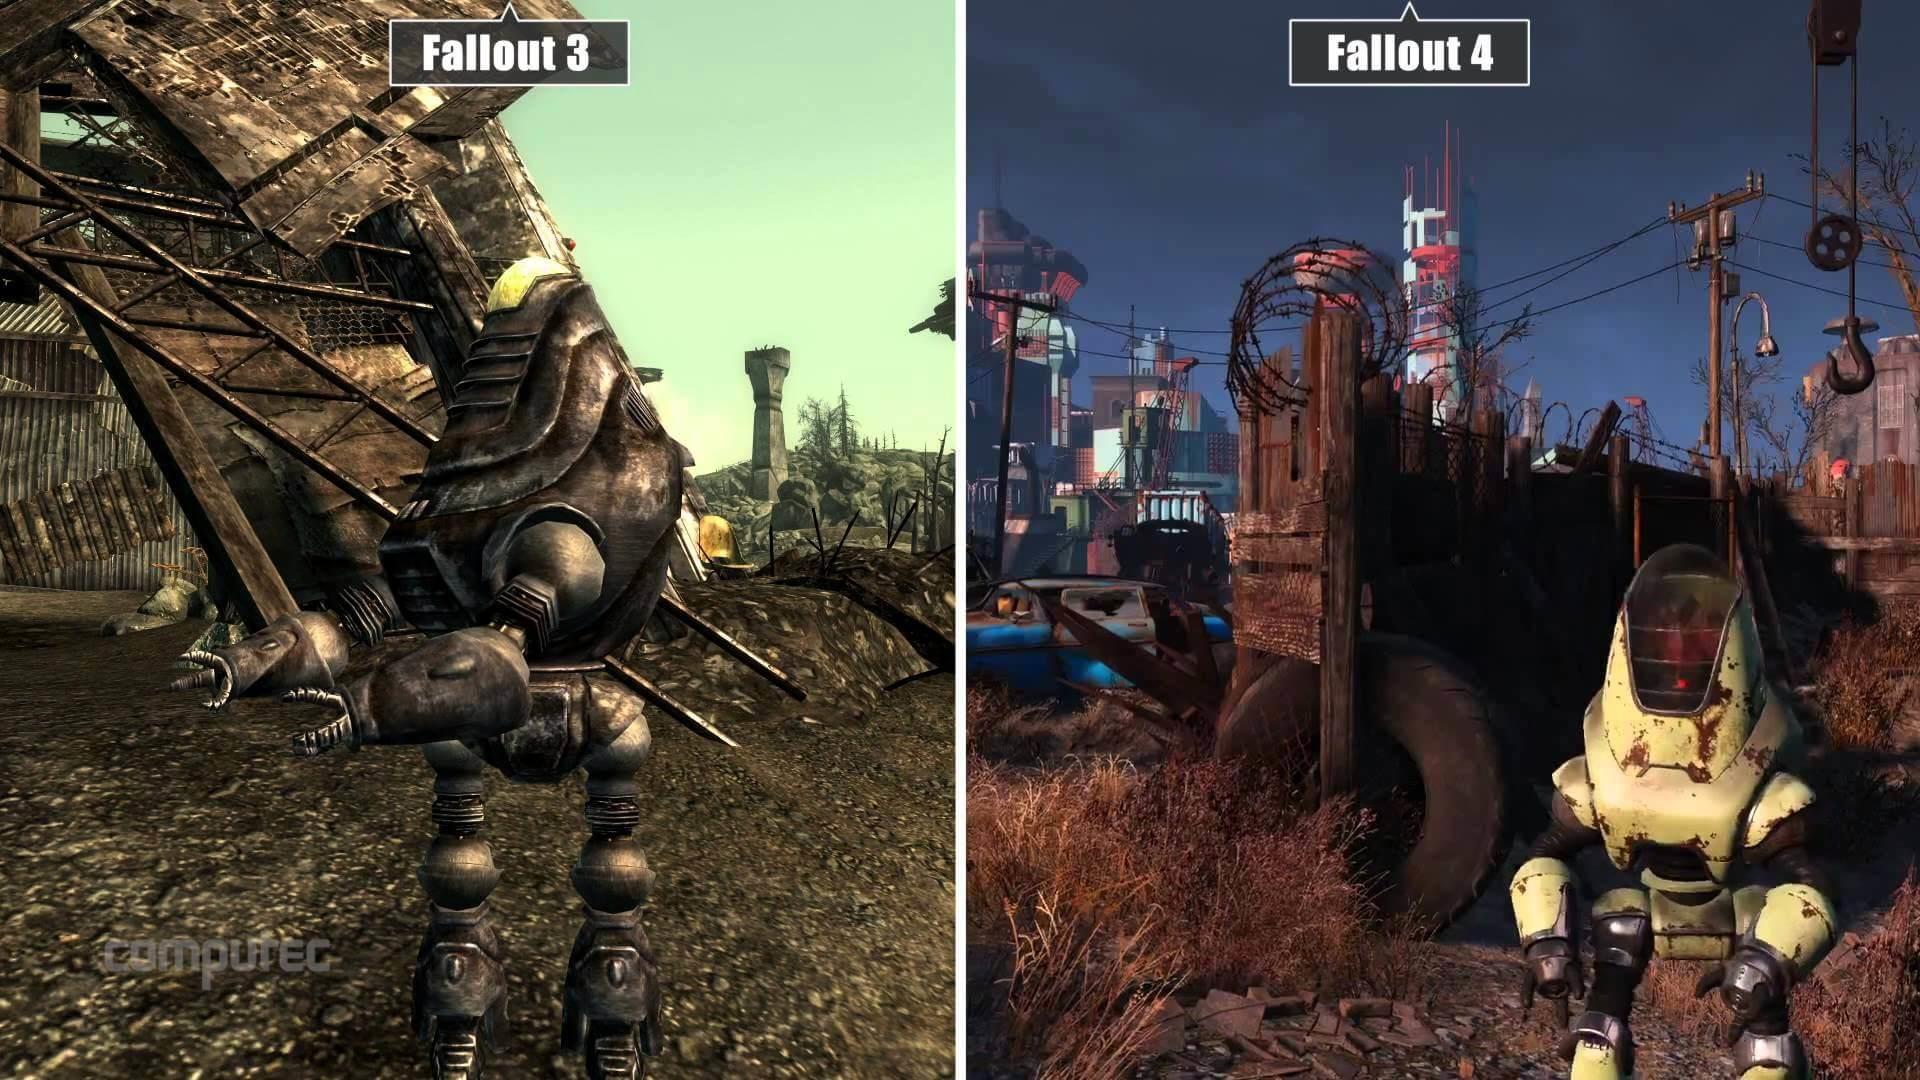 Fallout 3 Video Game desktop wallpaers #7